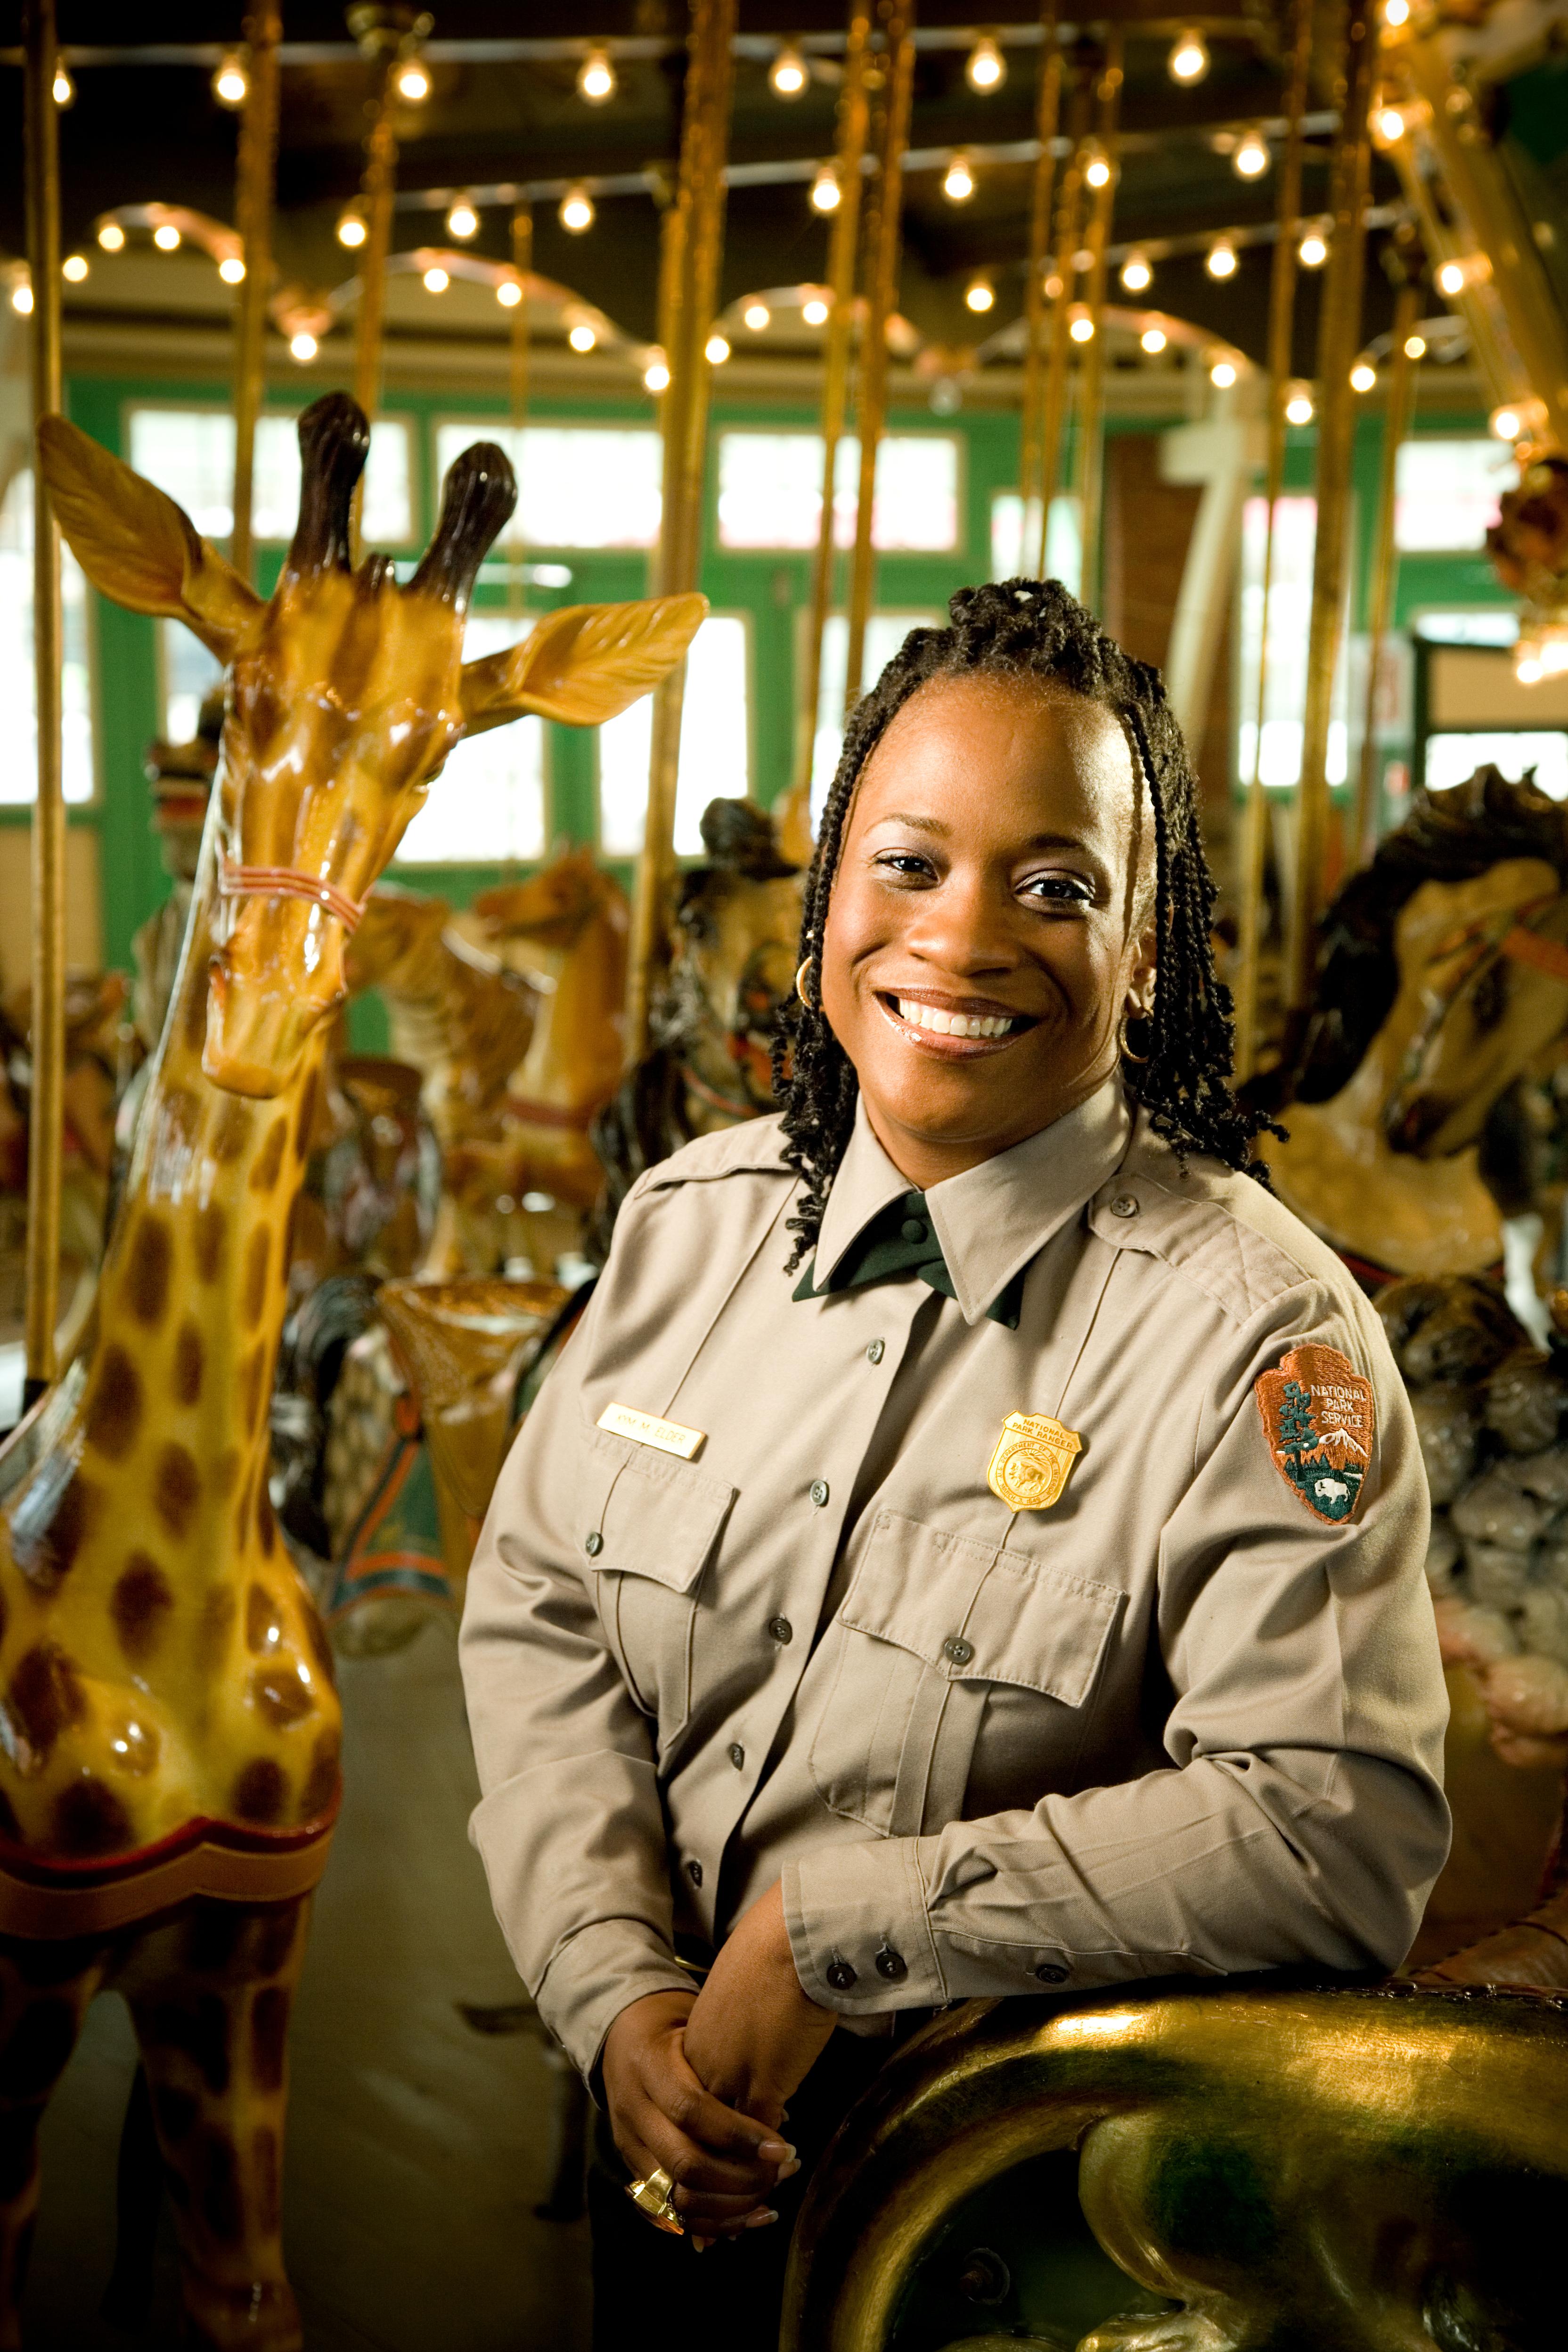 Park Service Employee